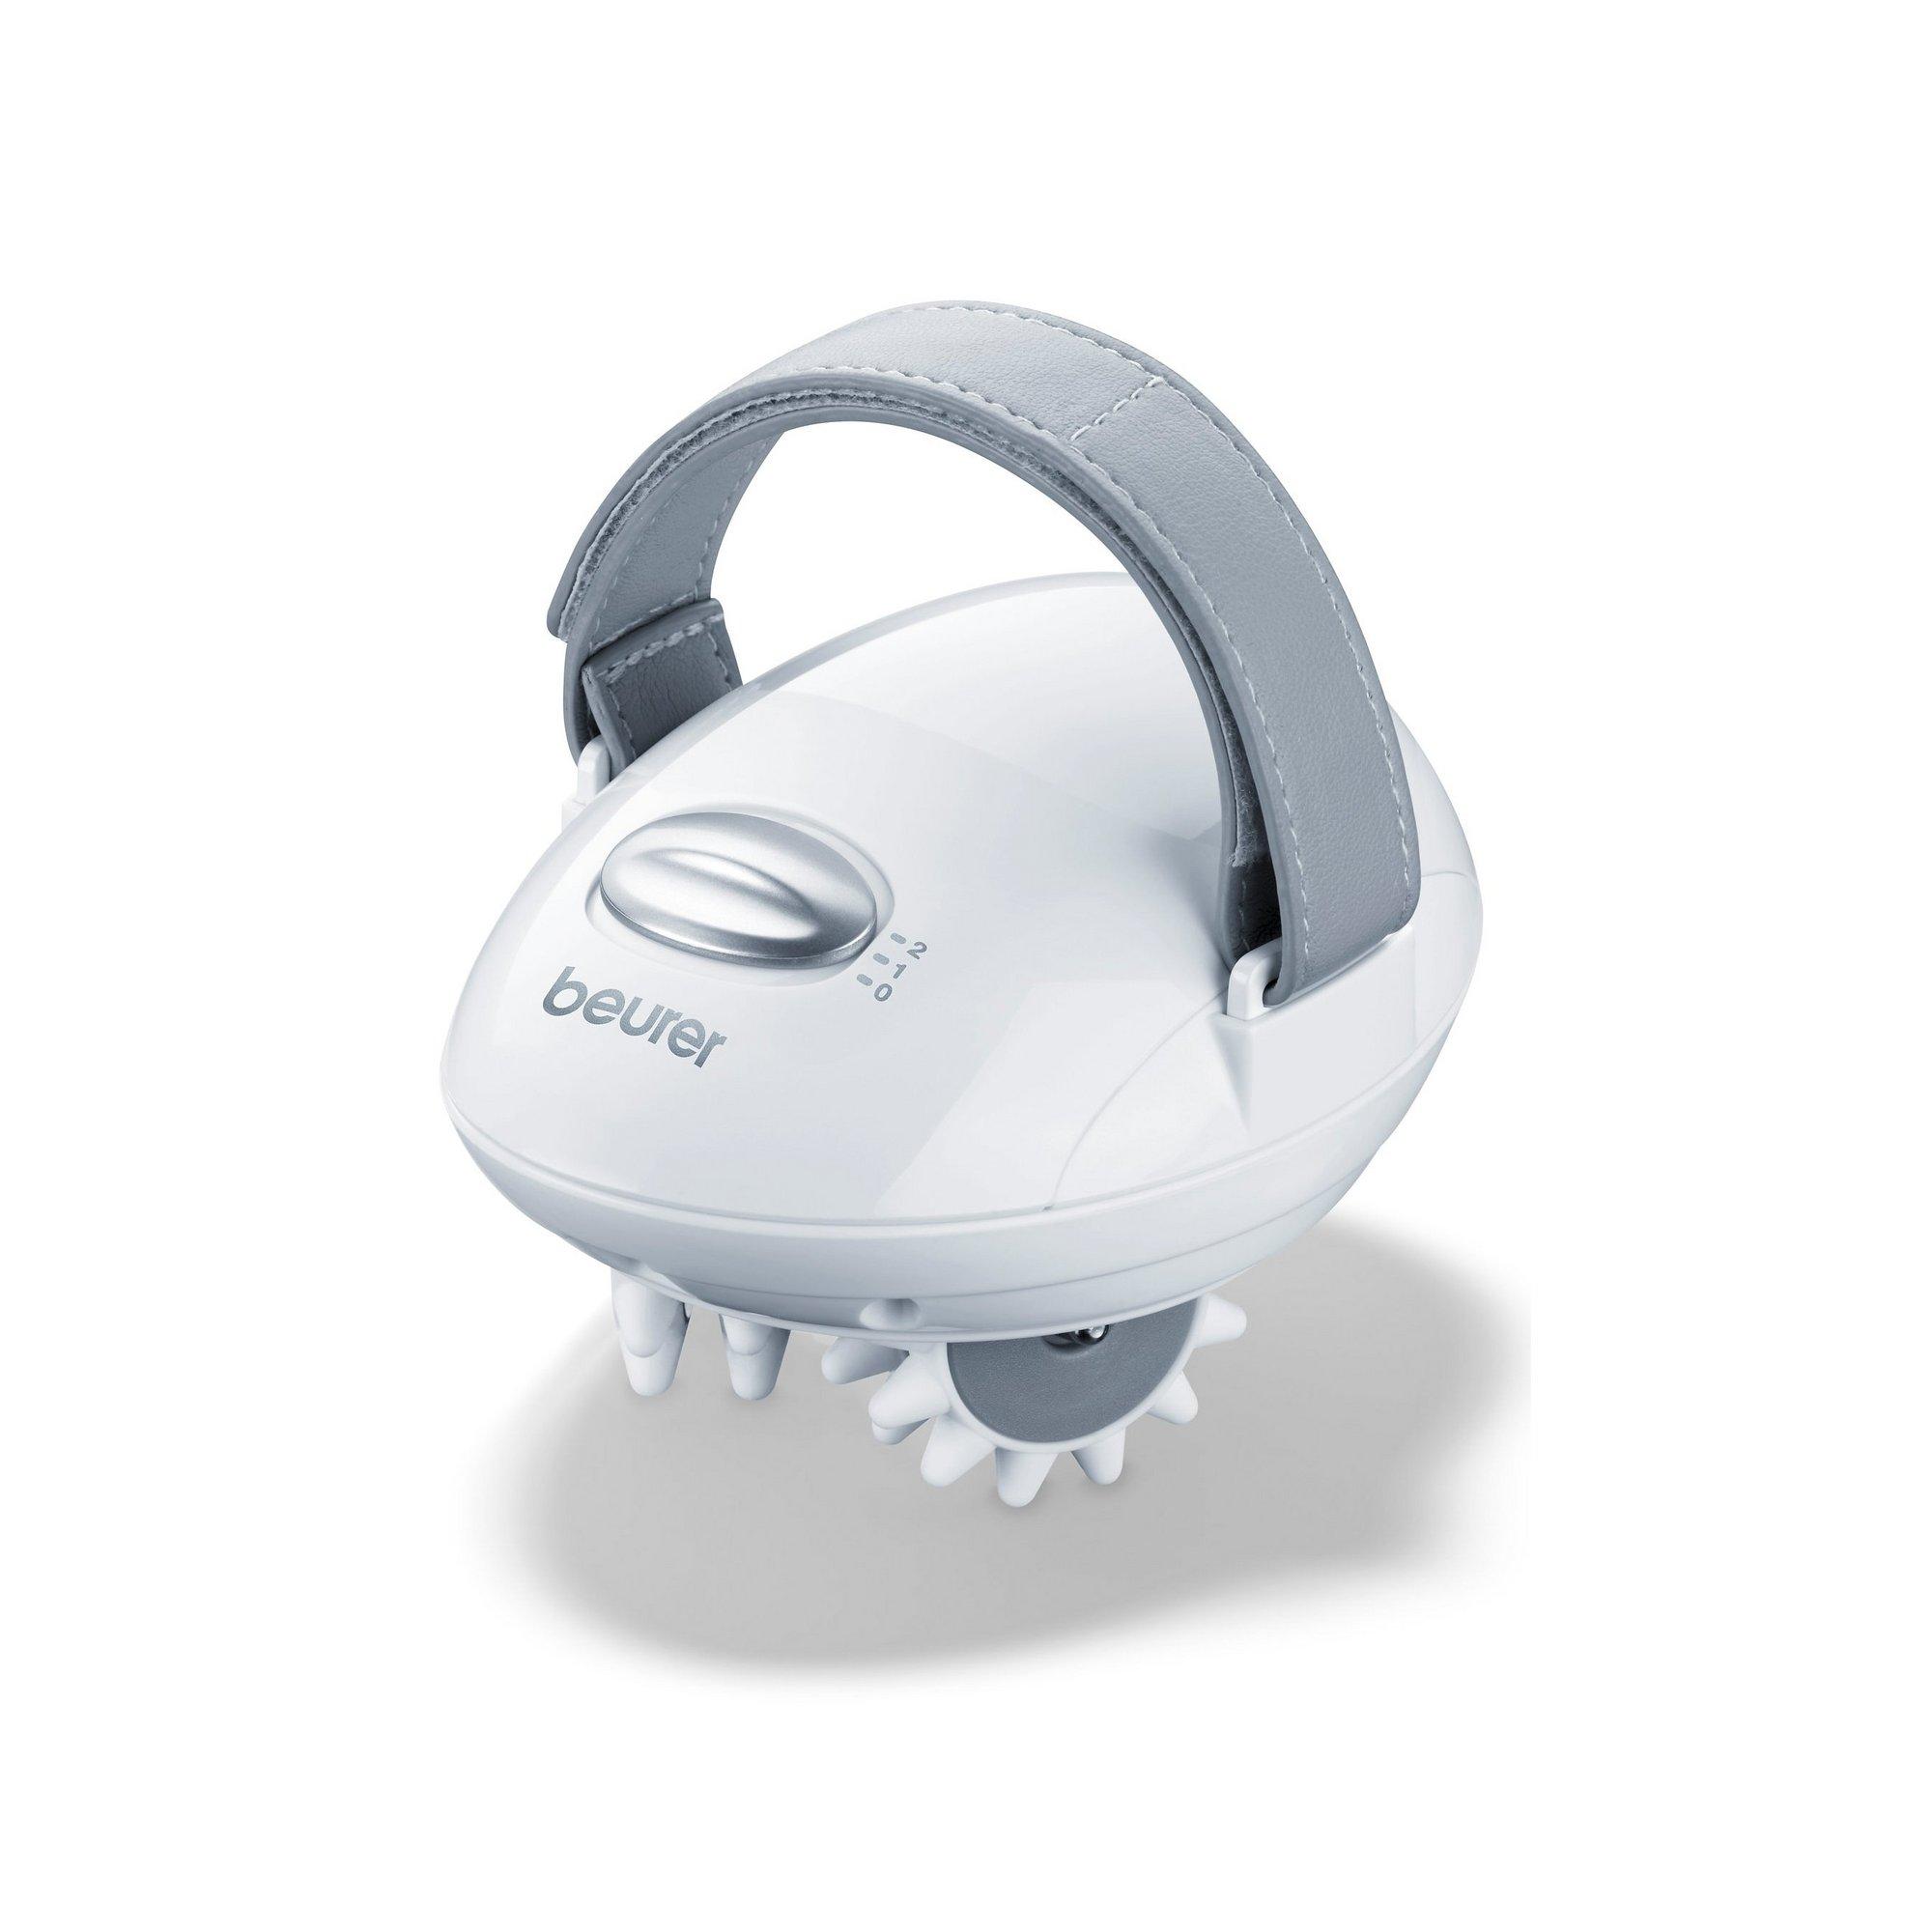 Image of Beurer Cellulite Massager CM50 with Vibration Massage